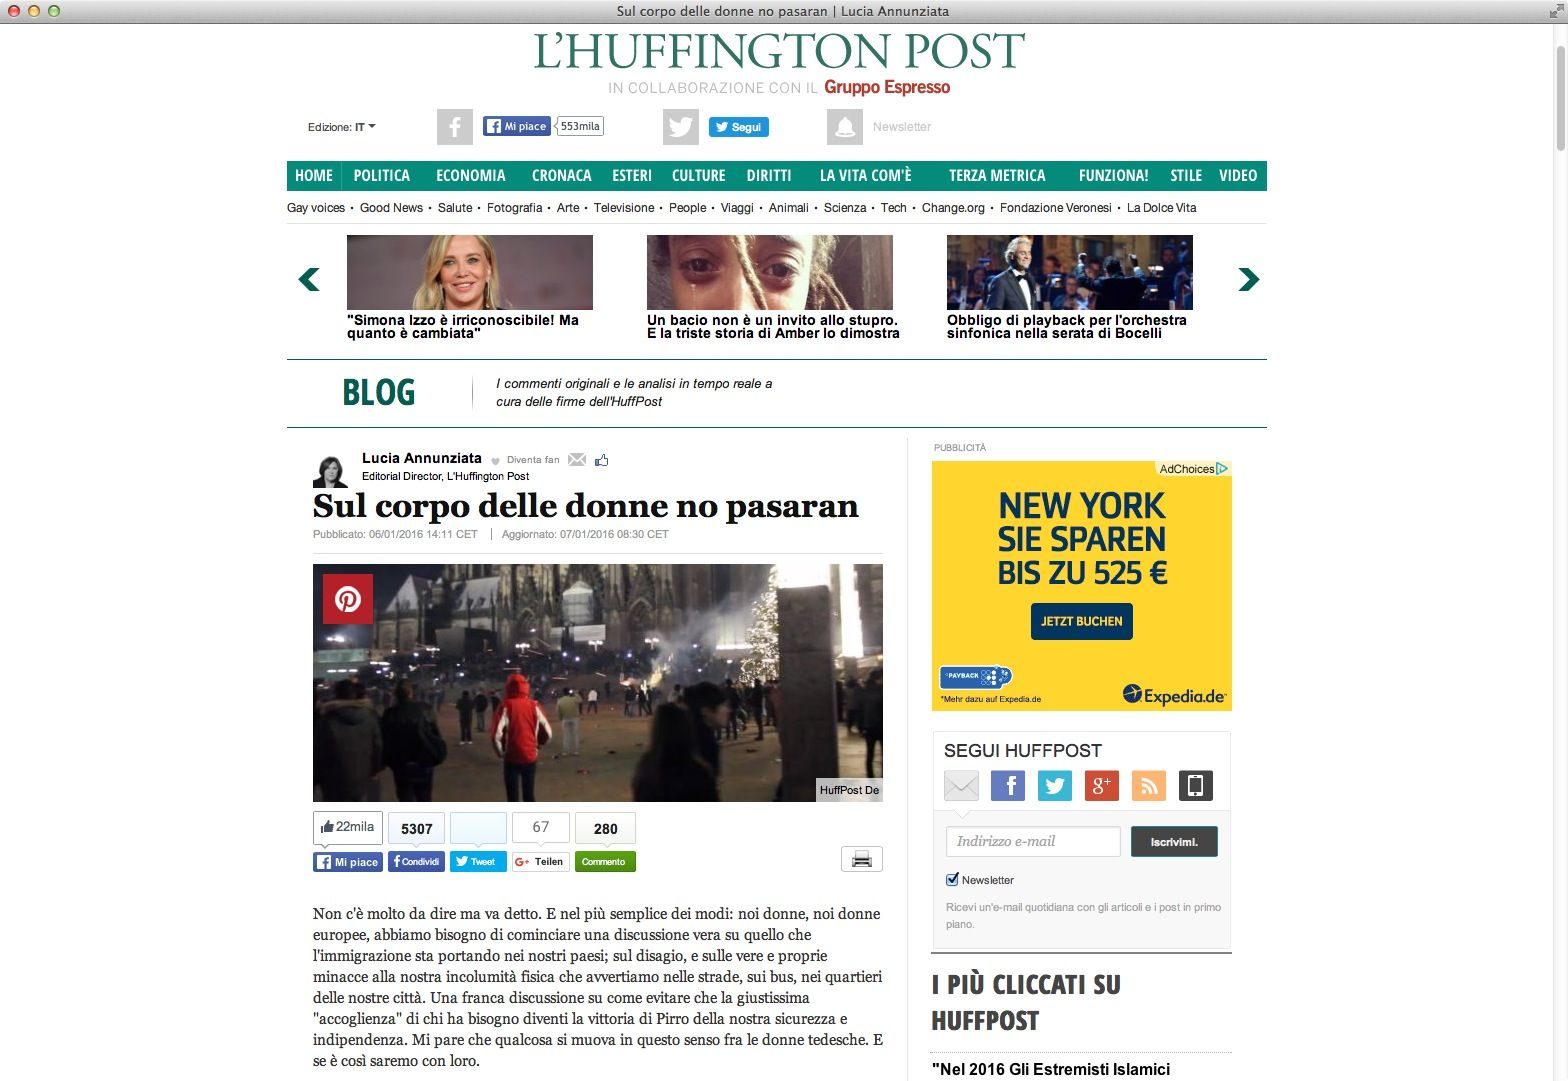 NUR ALS ZITAT Screenshot Huffington Post / Italien / Ãbergriffe Köln